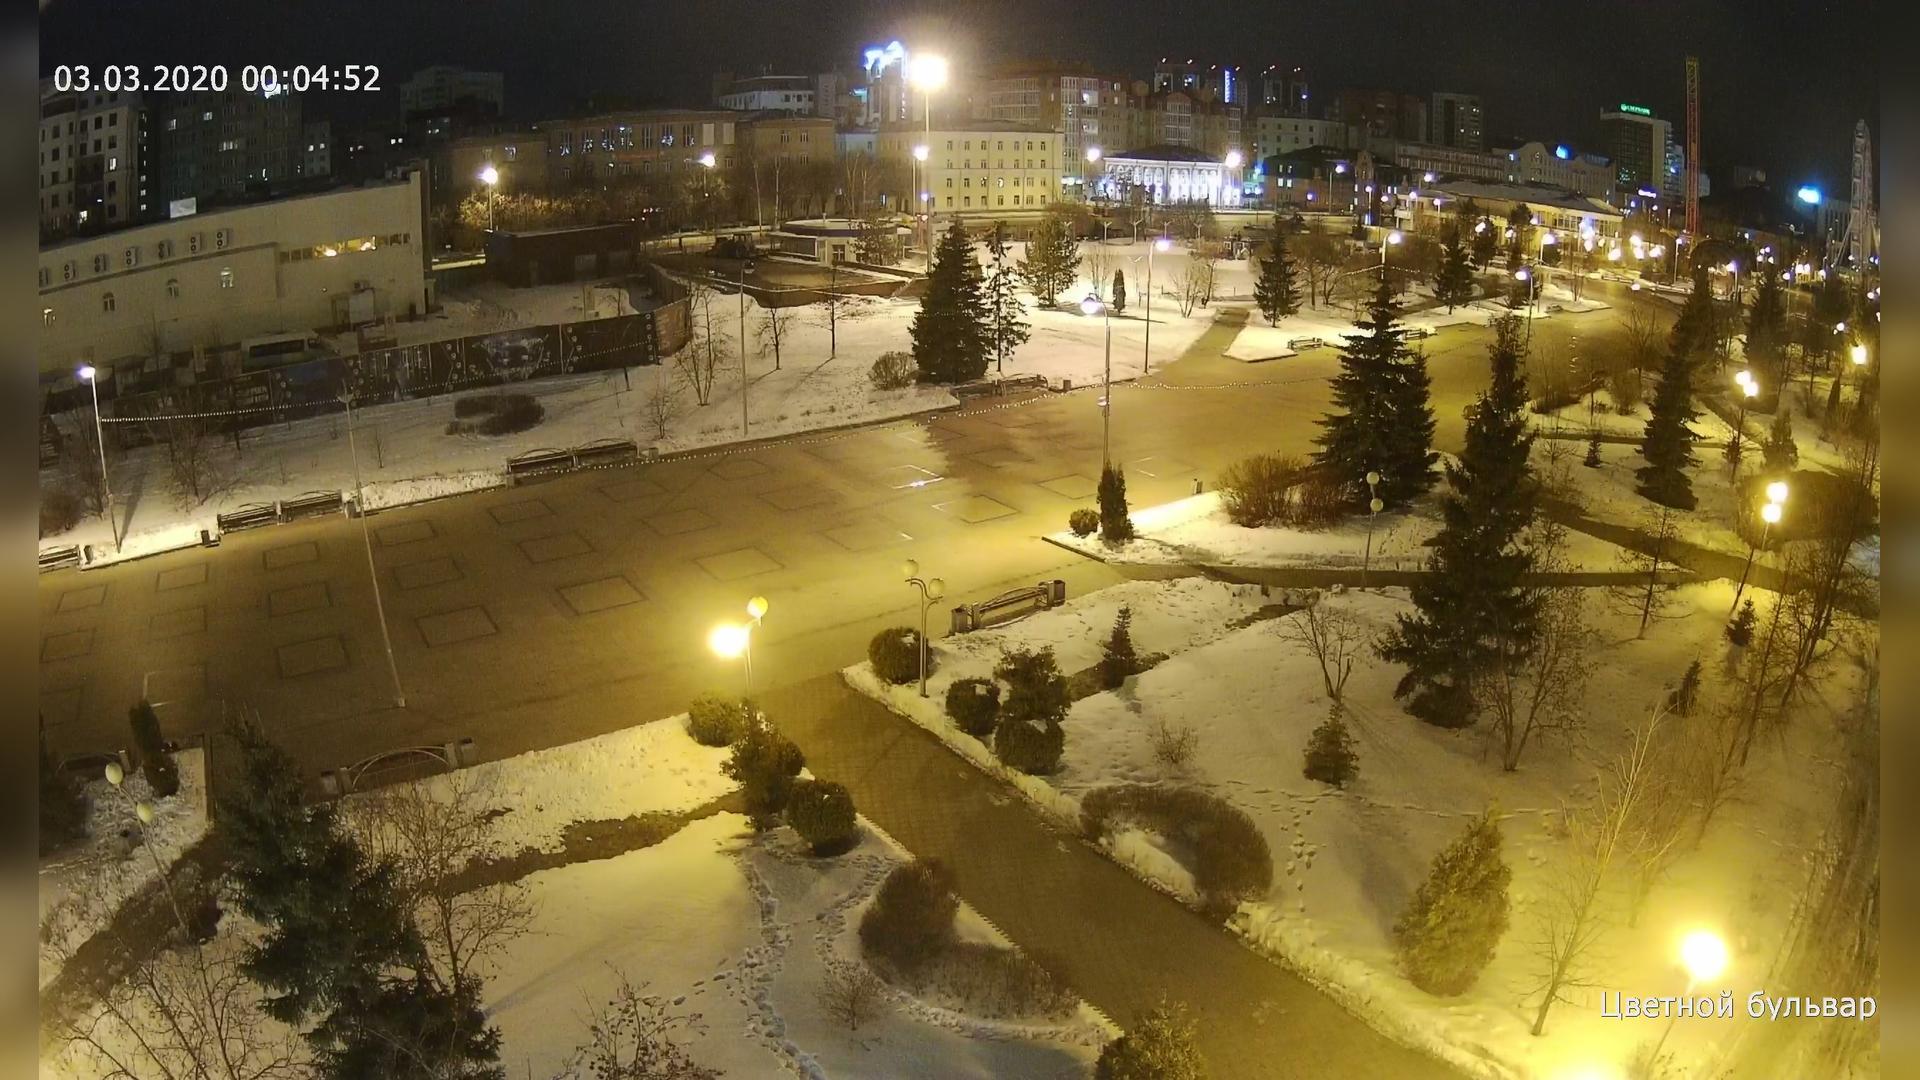 Webkamera Tyumen: Цветной бульвар